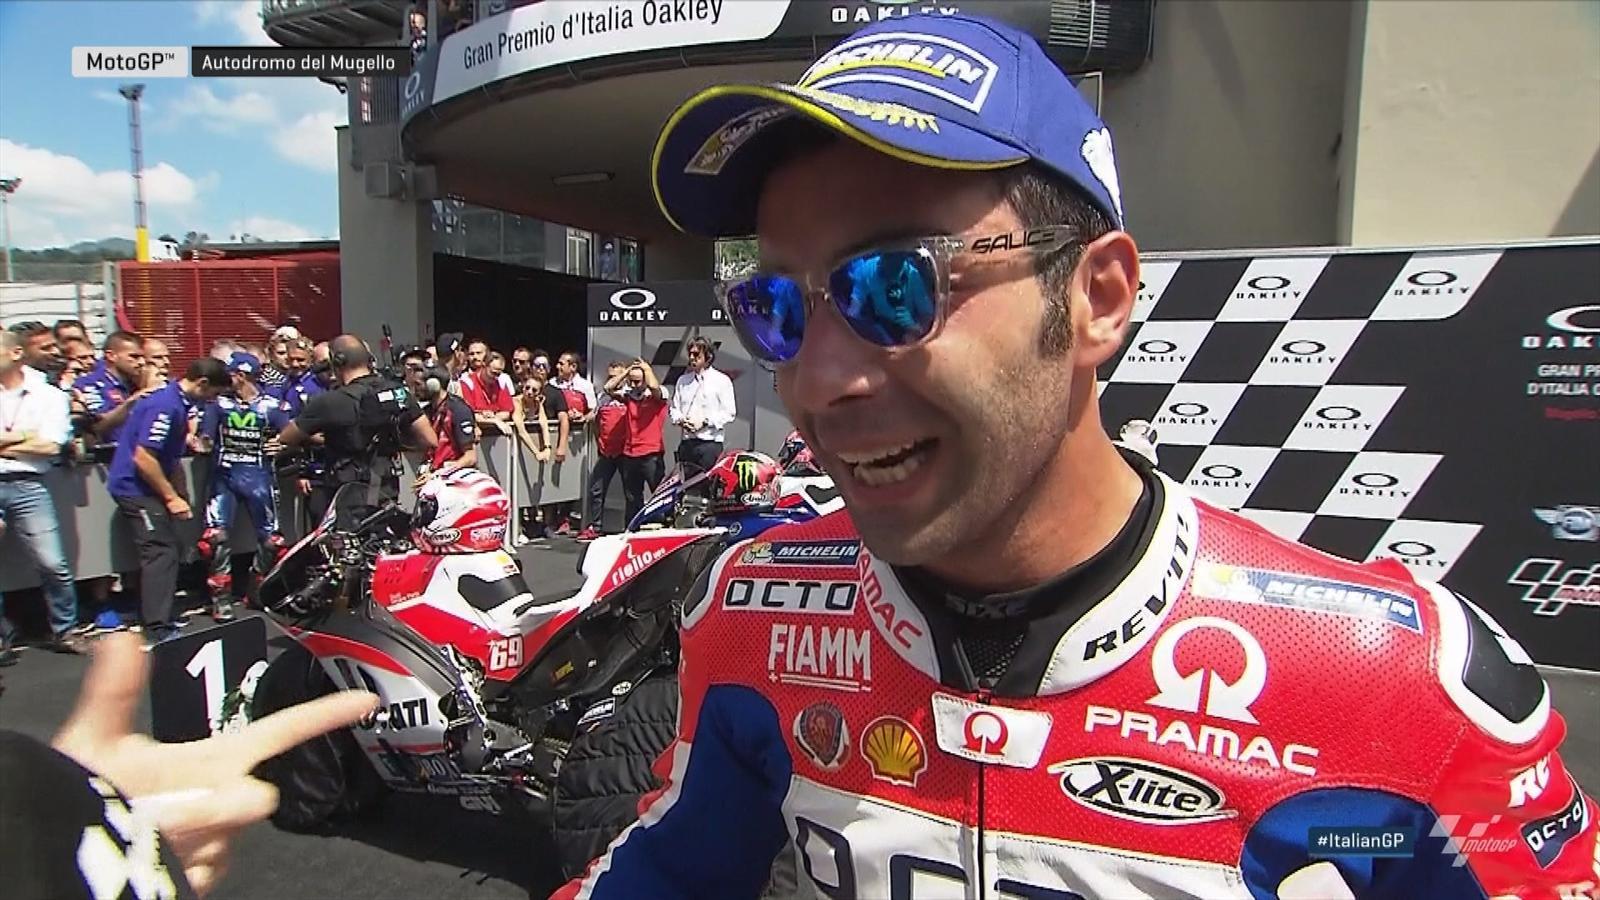 6c03db78dbfddc VIDEO - MotoGP - Danilo Petrucci (Ducati Pramac)